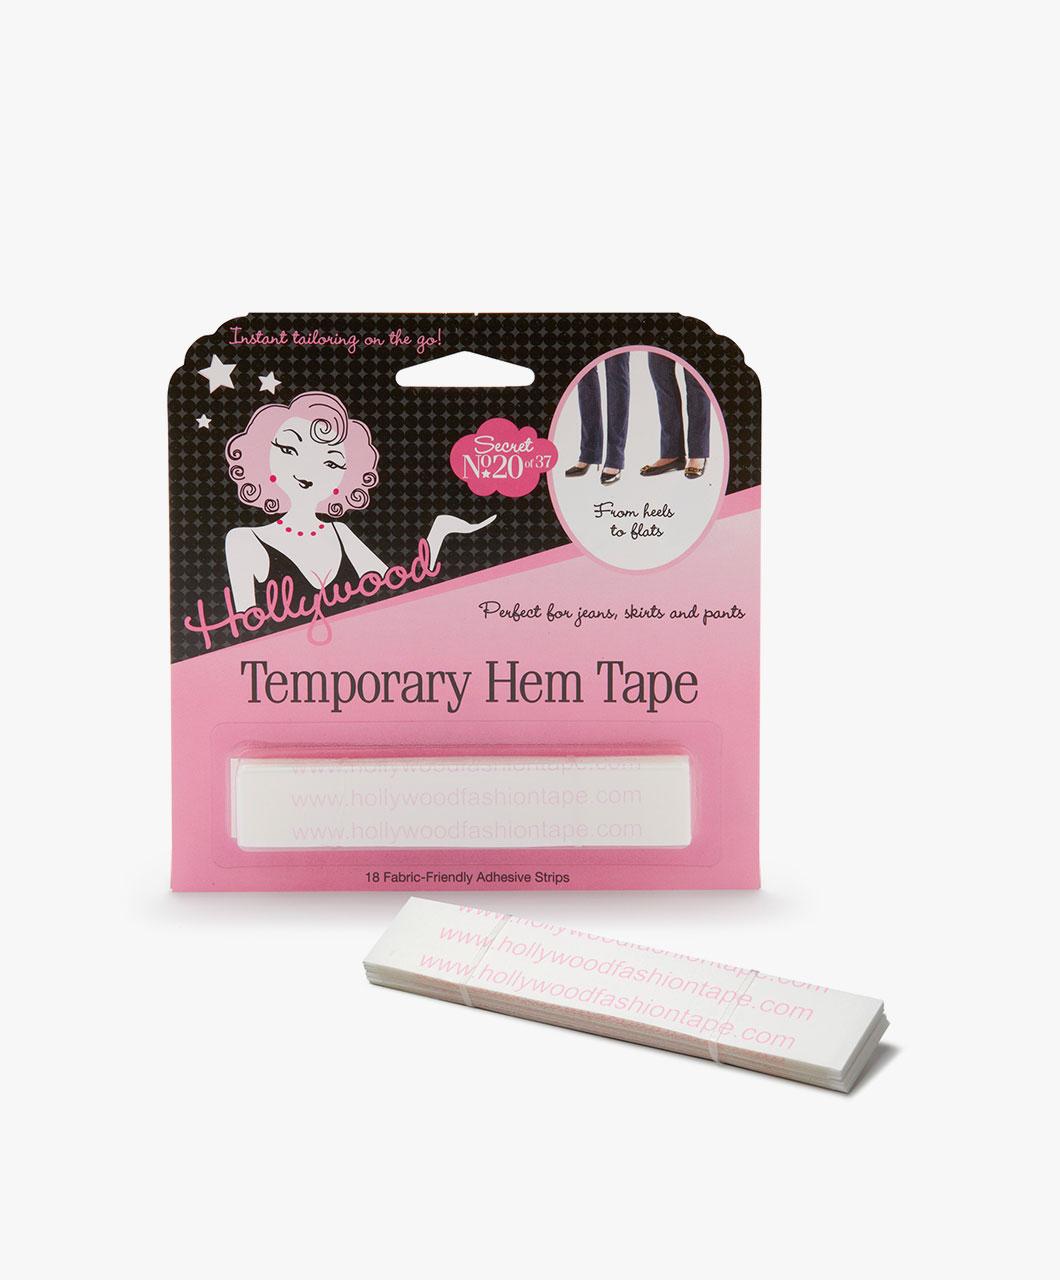 hollywood fashion secrets temporary hem tape hfs 10081 clear. Black Bedroom Furniture Sets. Home Design Ideas